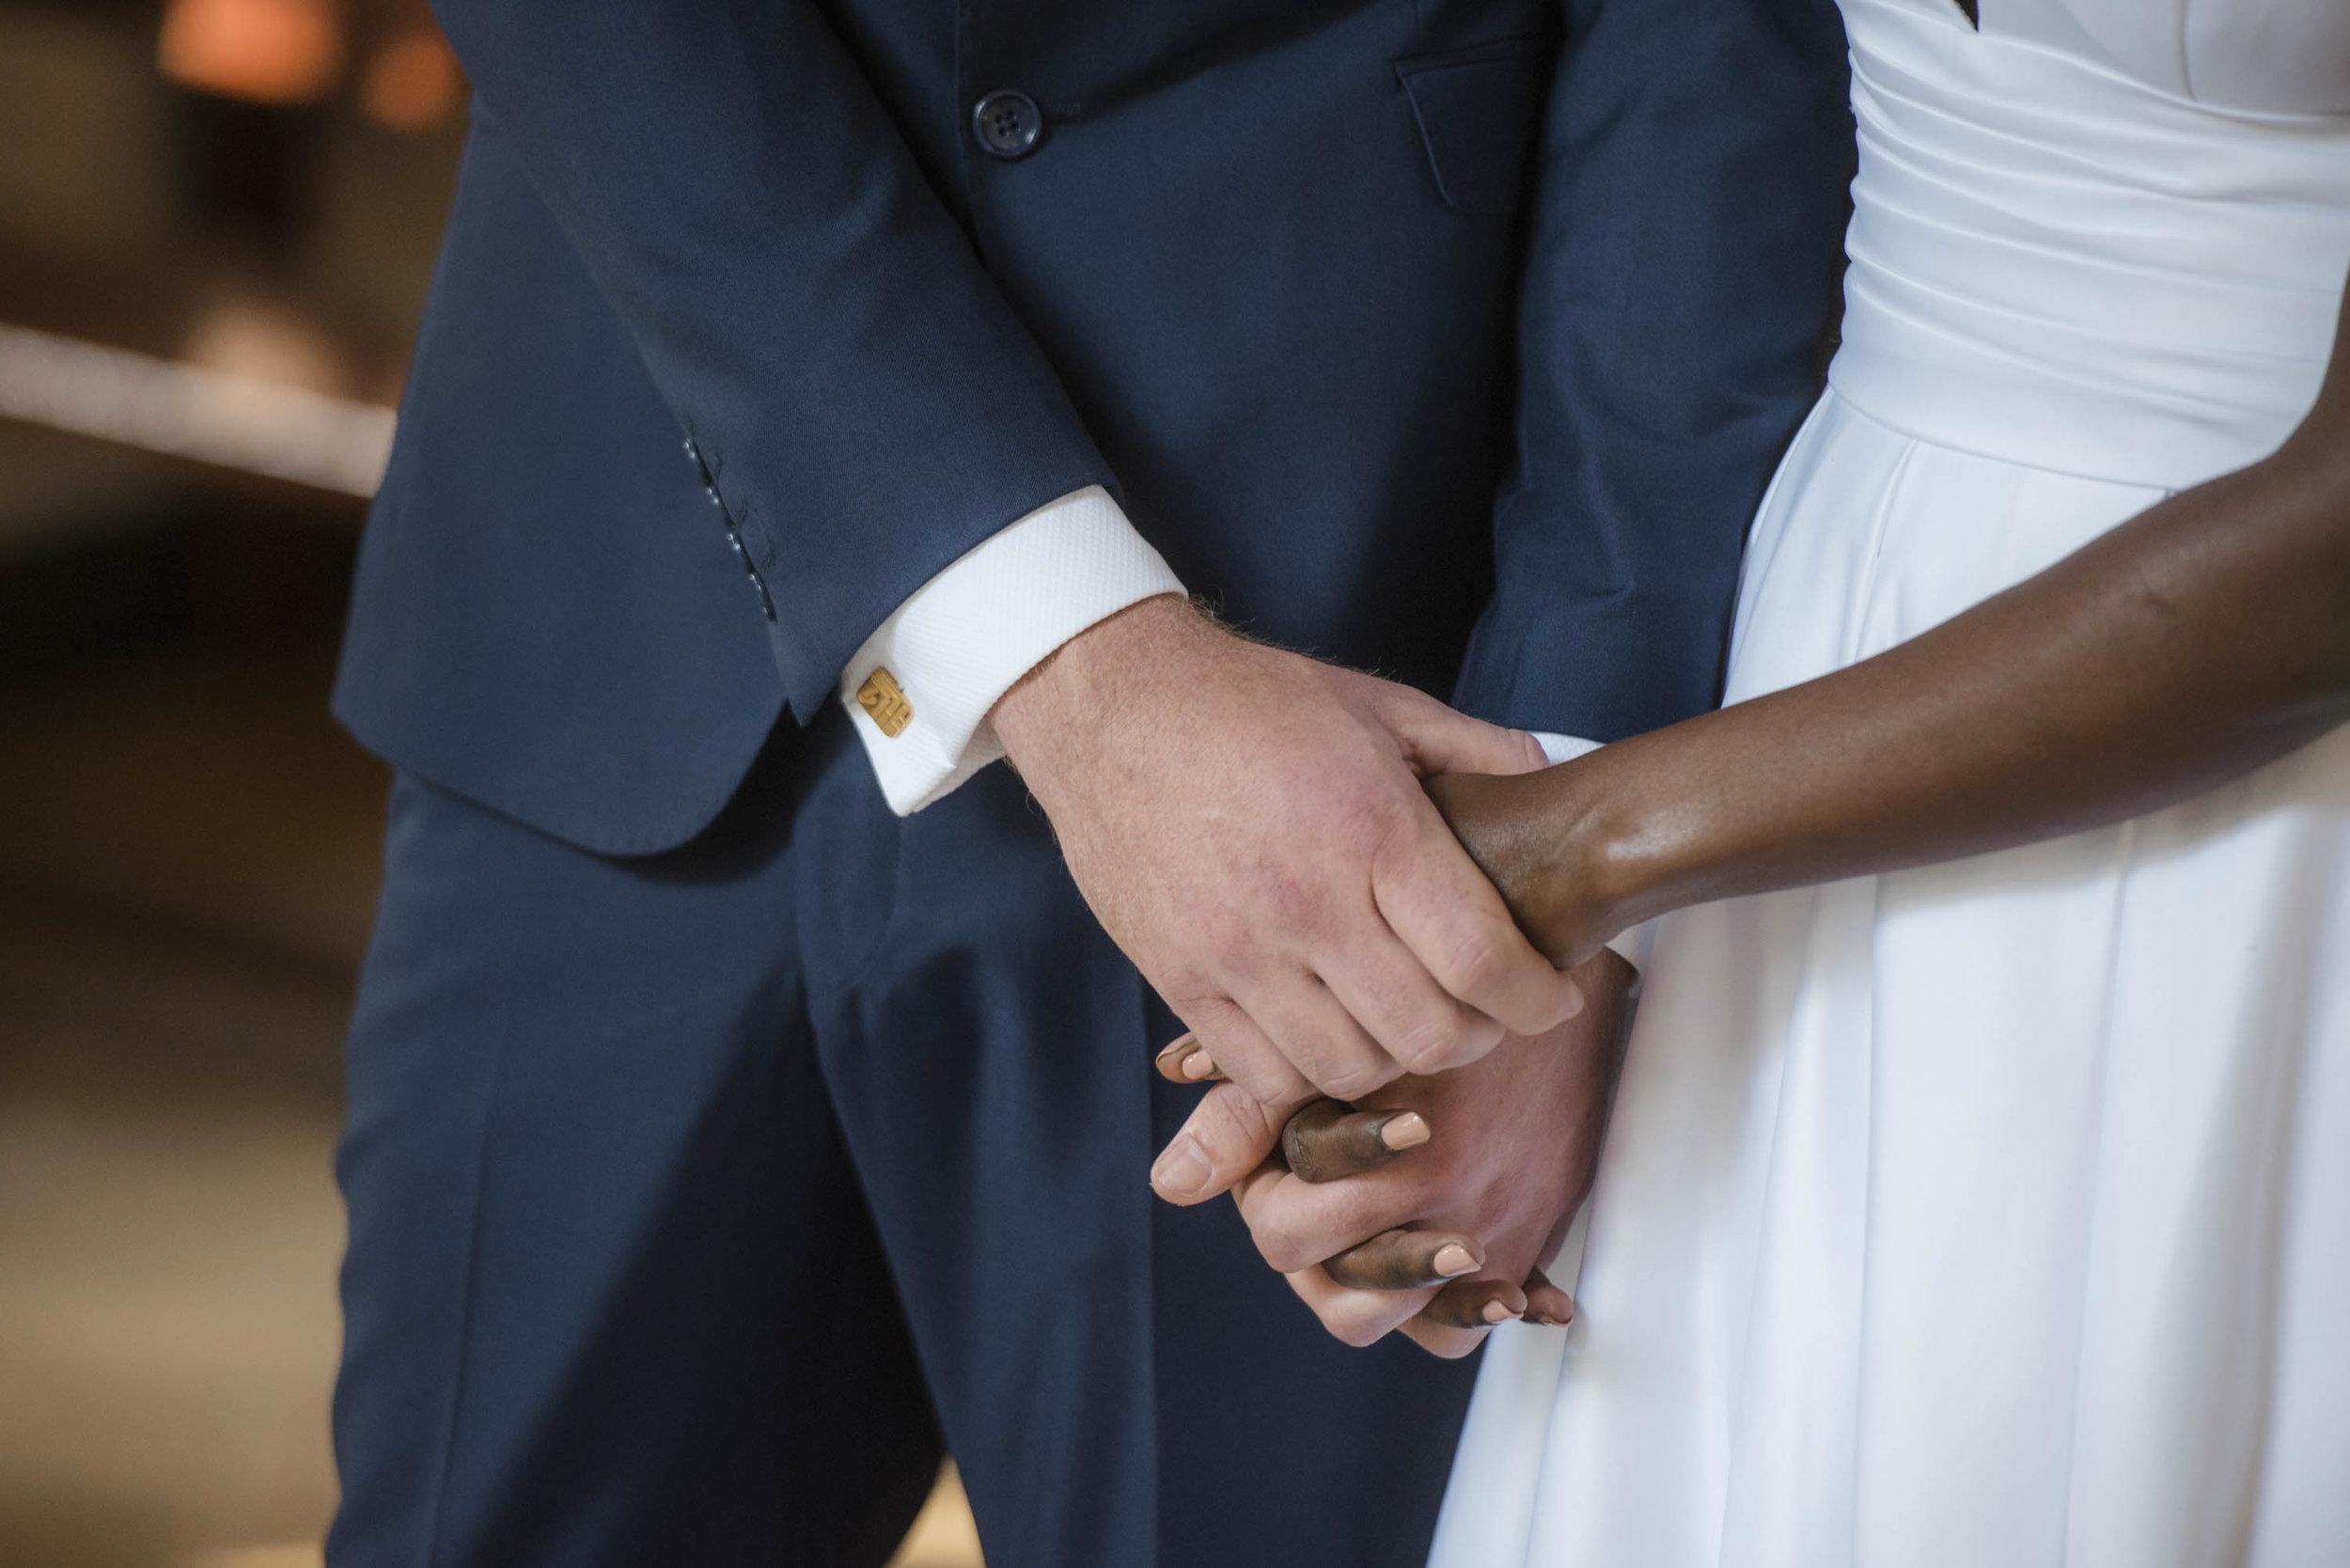 070-wedding-photographers-johannesburg.JPG